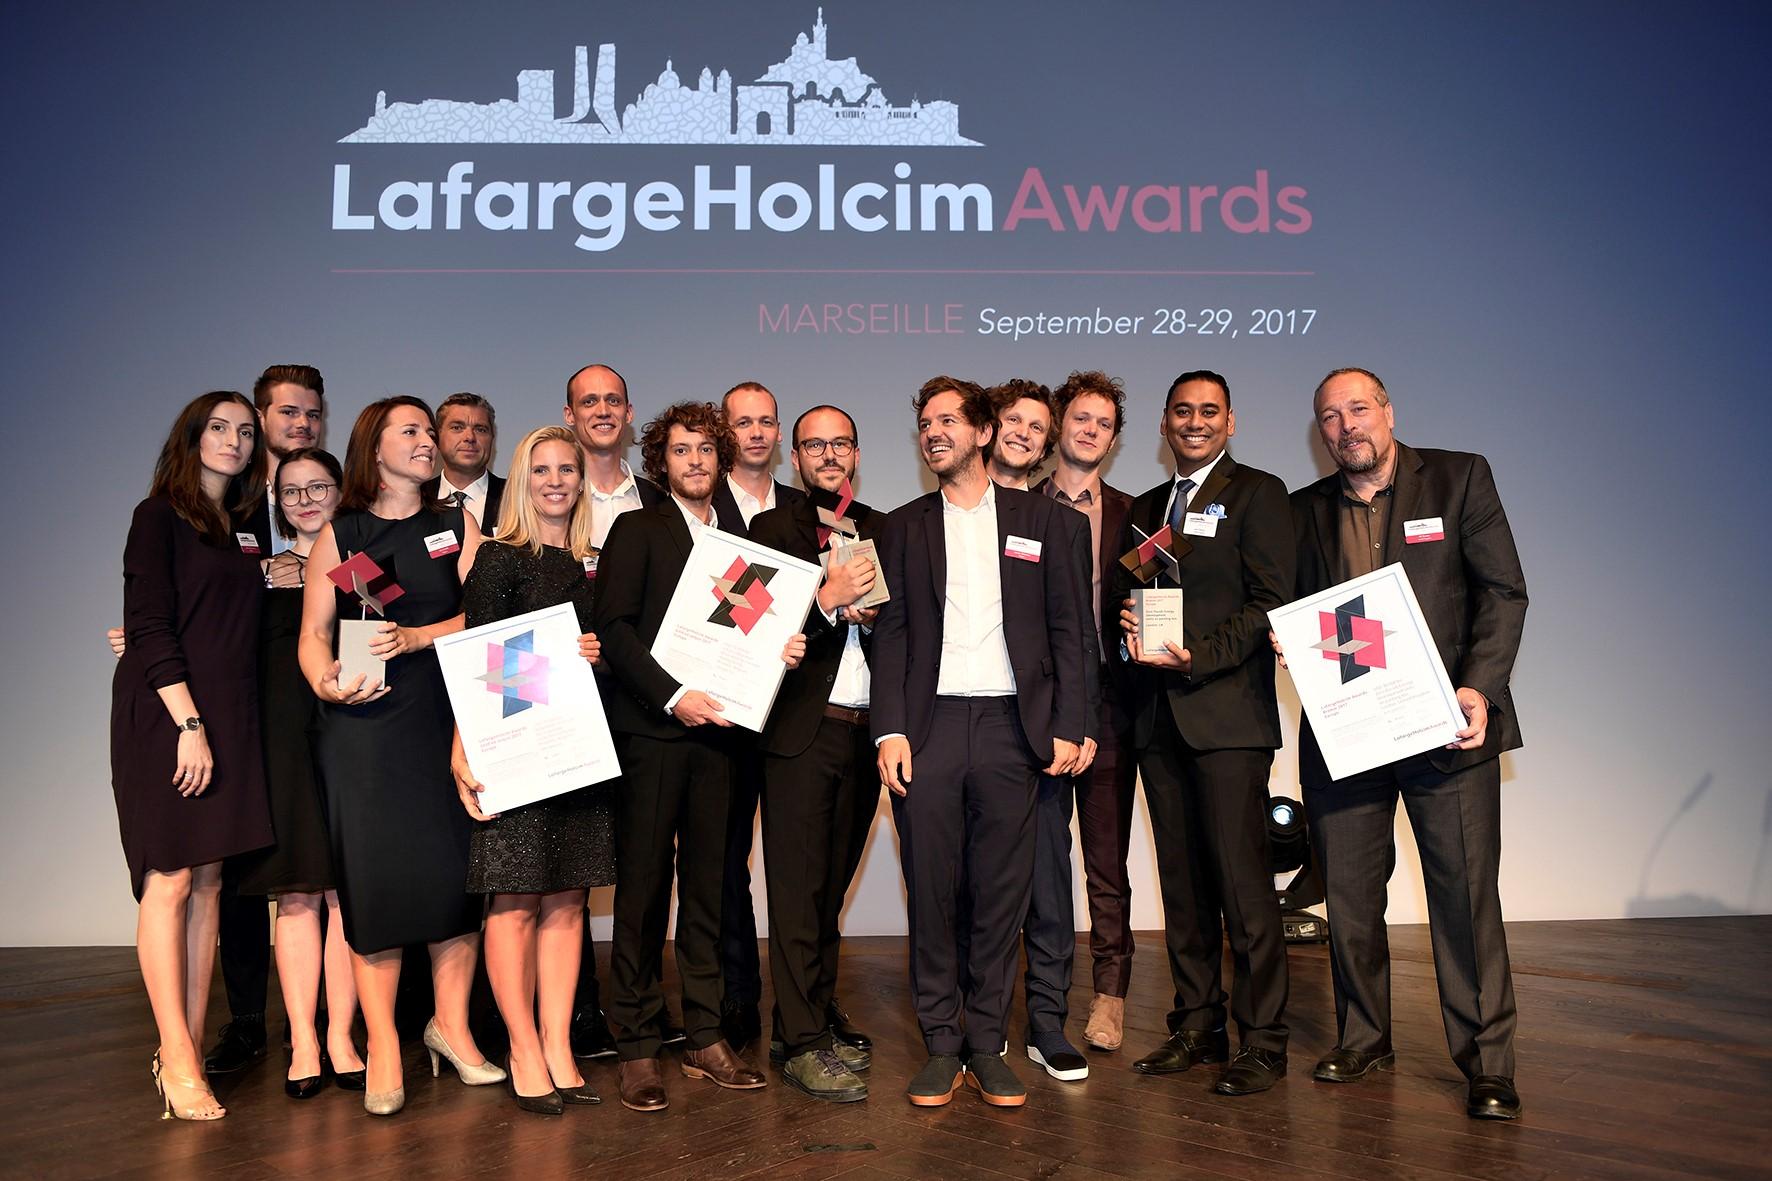 Az Európai LafargeHolcim-díj nyertesei, 2017